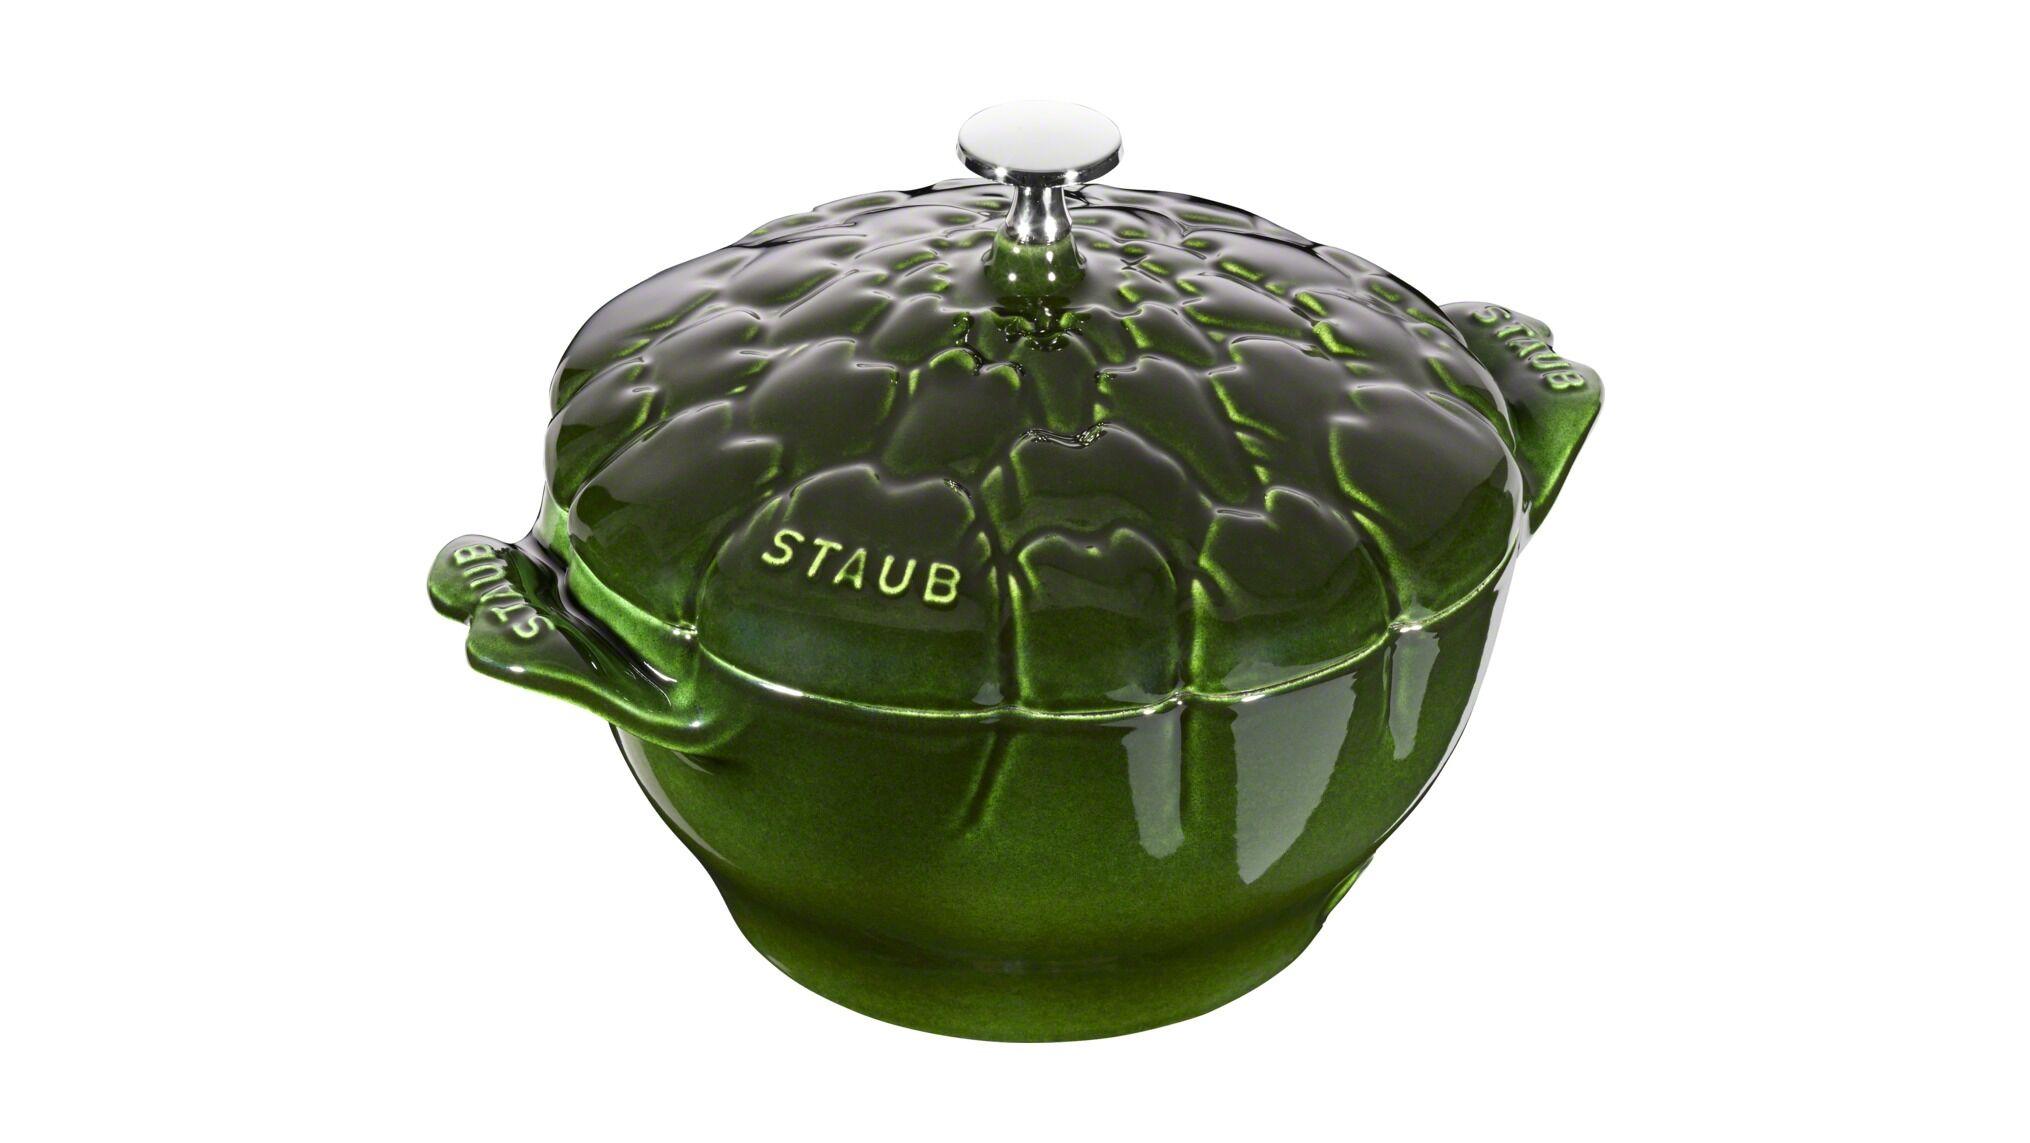 Staub Artiskok cocotte, Unikke gryder, 22 cm, Basilikumgrøn